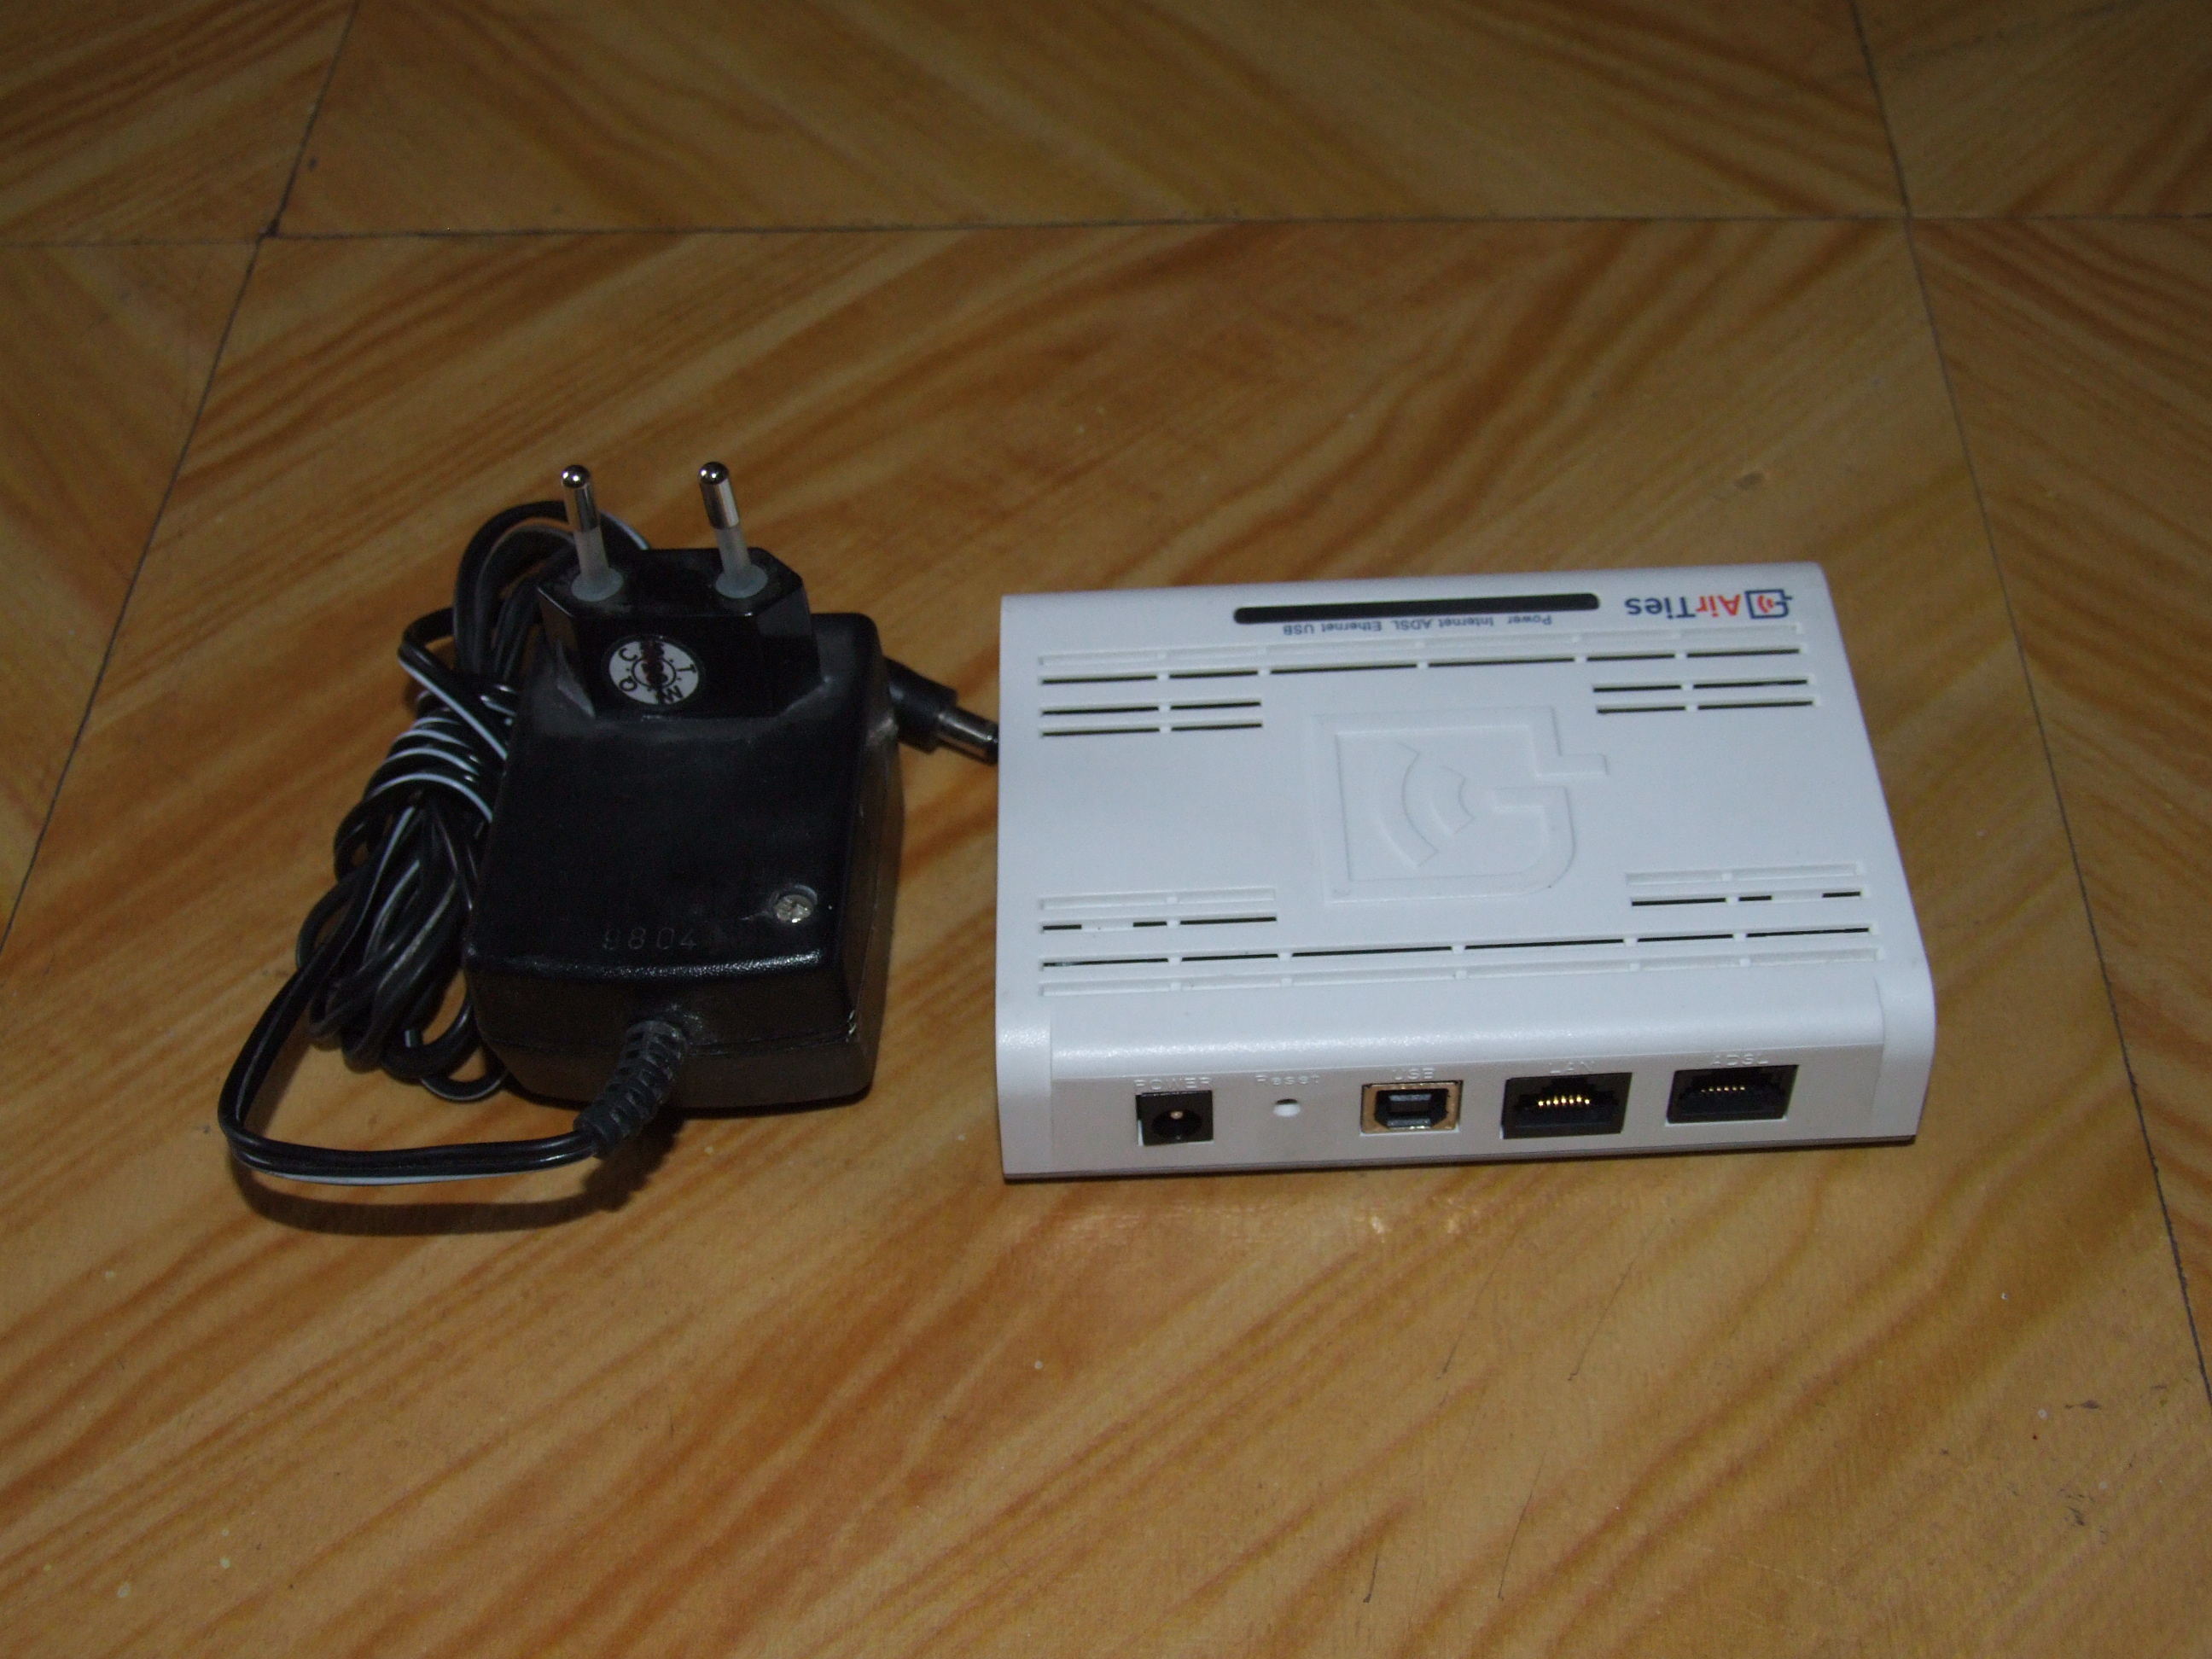 TÉLÉCHARGER LG USB MODEM DRIVER KU990